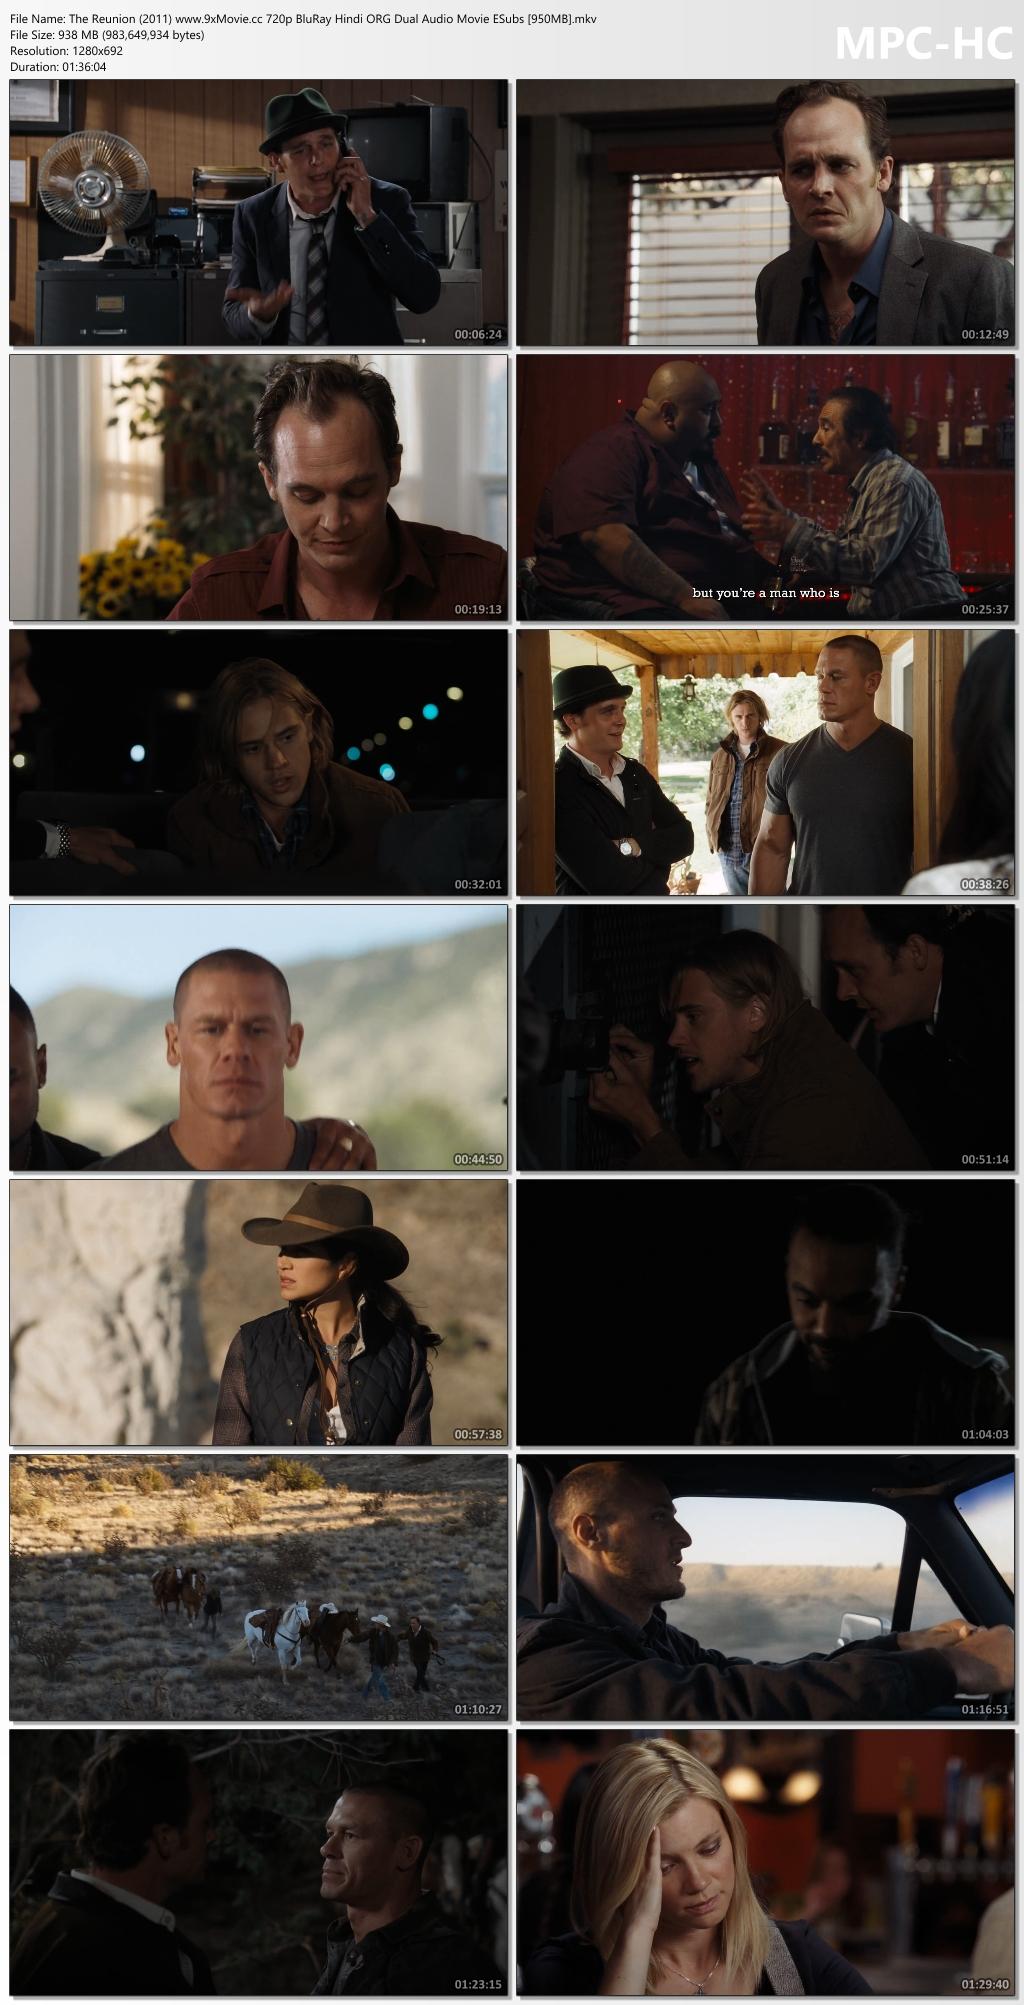 The-Reunion-2011-www-9x-Movie-cc-720p-Blu-Ray-Hindi-ORG-Dual-Audio-Movie-ESubs-950-MB-mkv